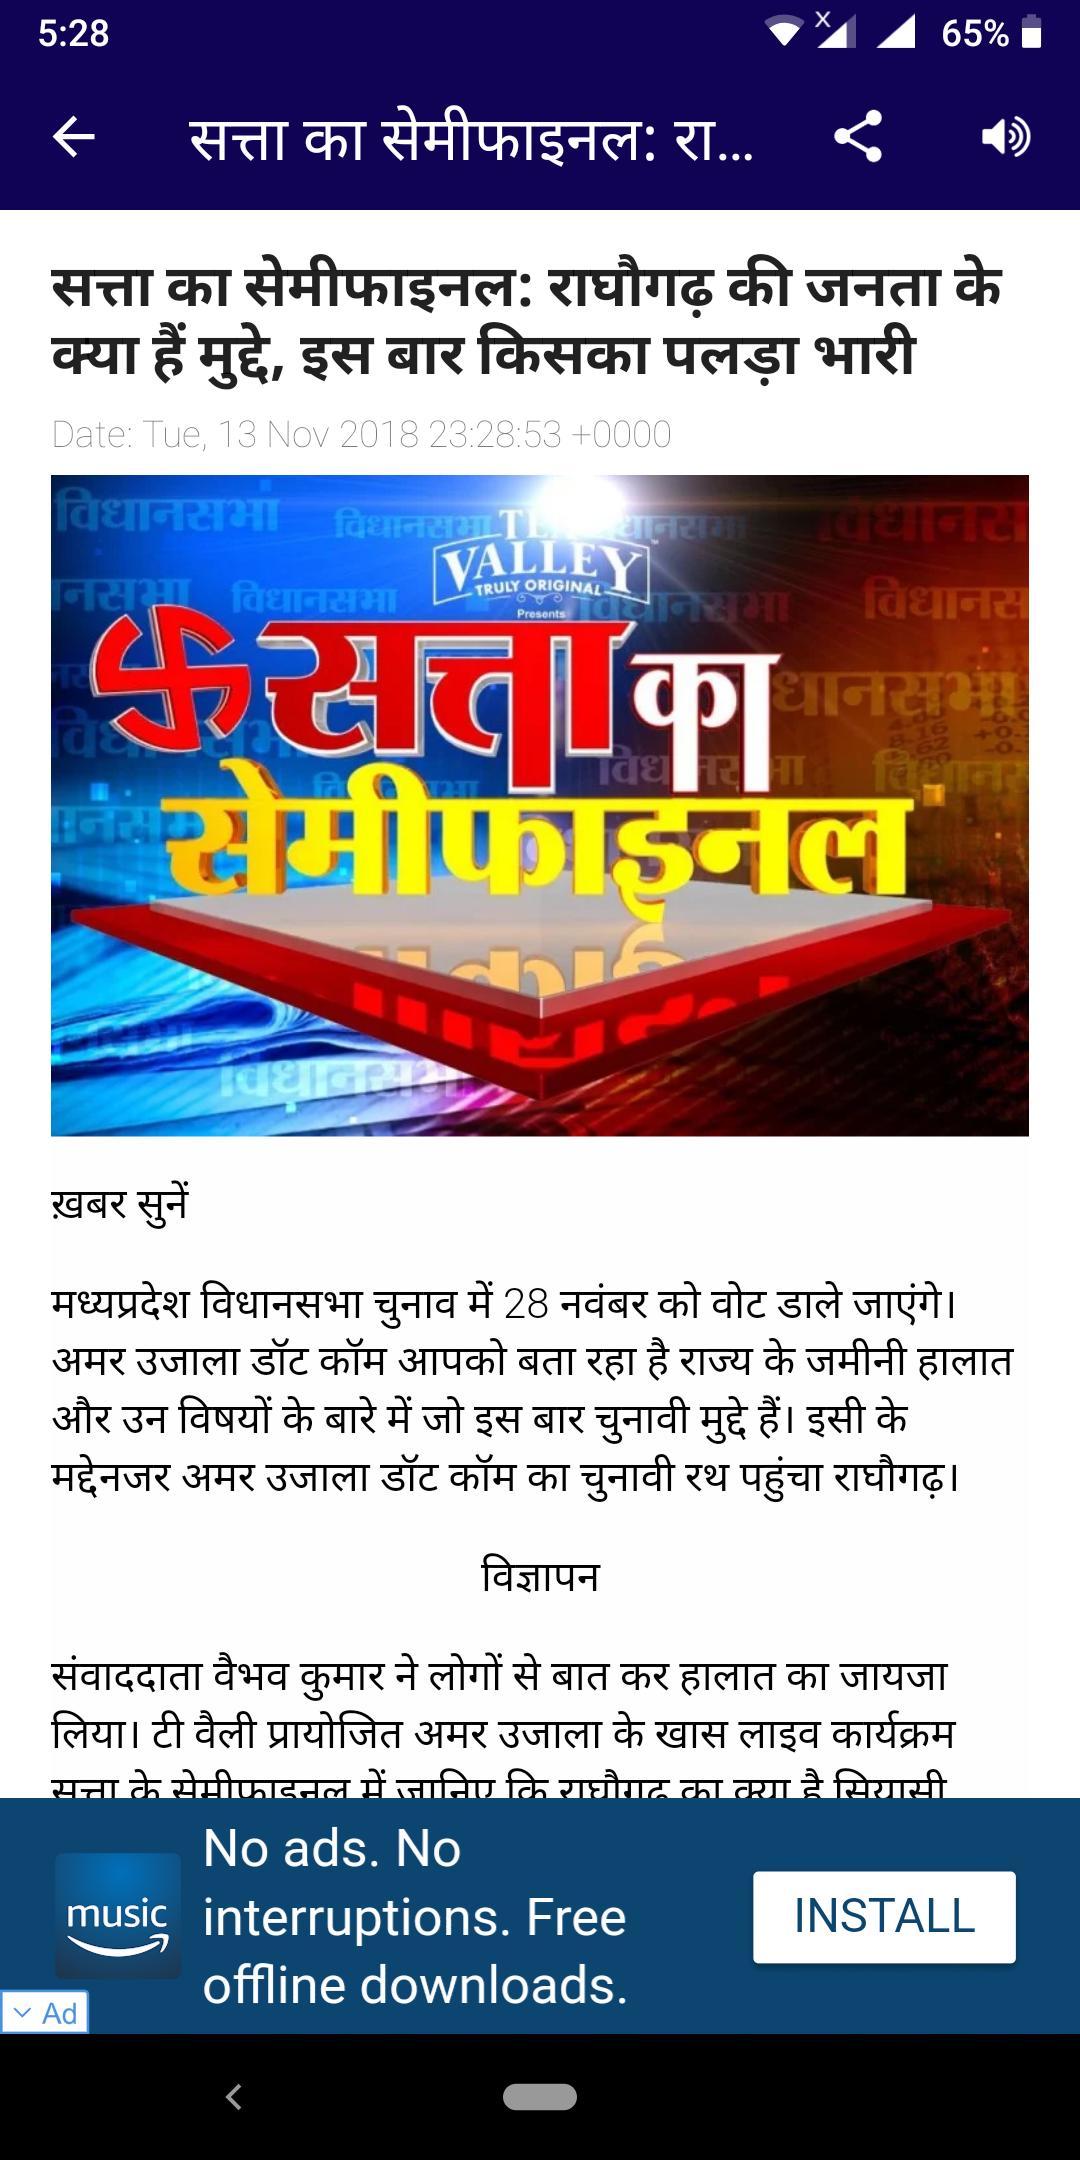 Aaj Ki Hindi Taja Khabar Fatafat: All City News for Android - APK